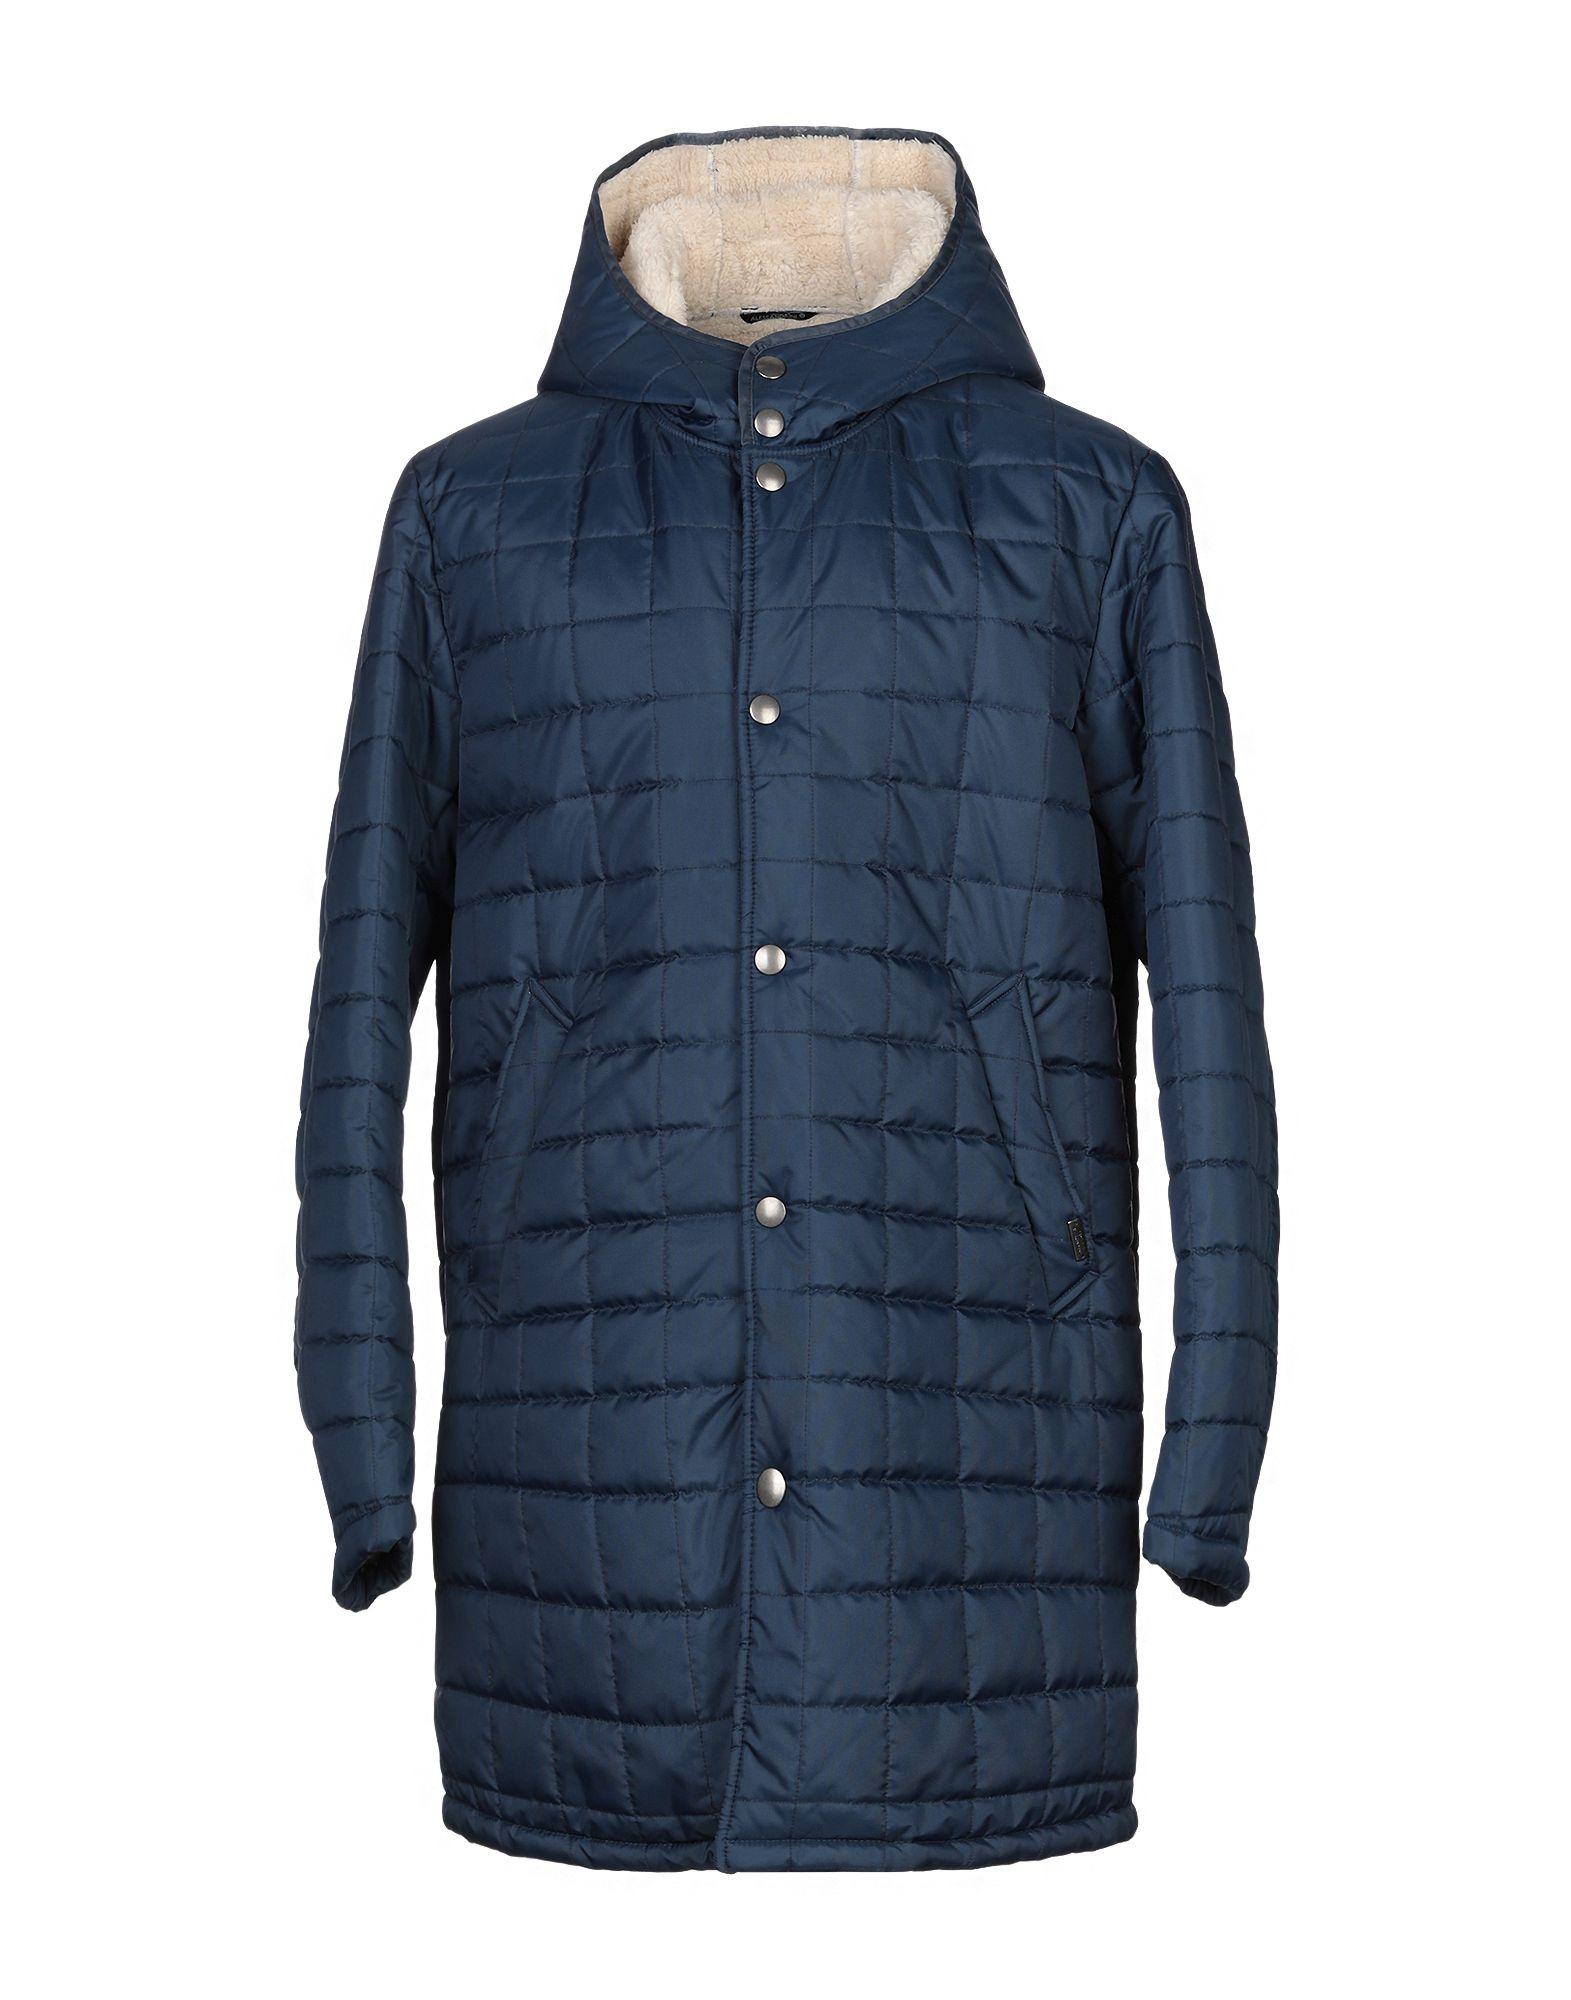 DANIELE ALESSANDRINI Пальто пальто с капюшоном 50